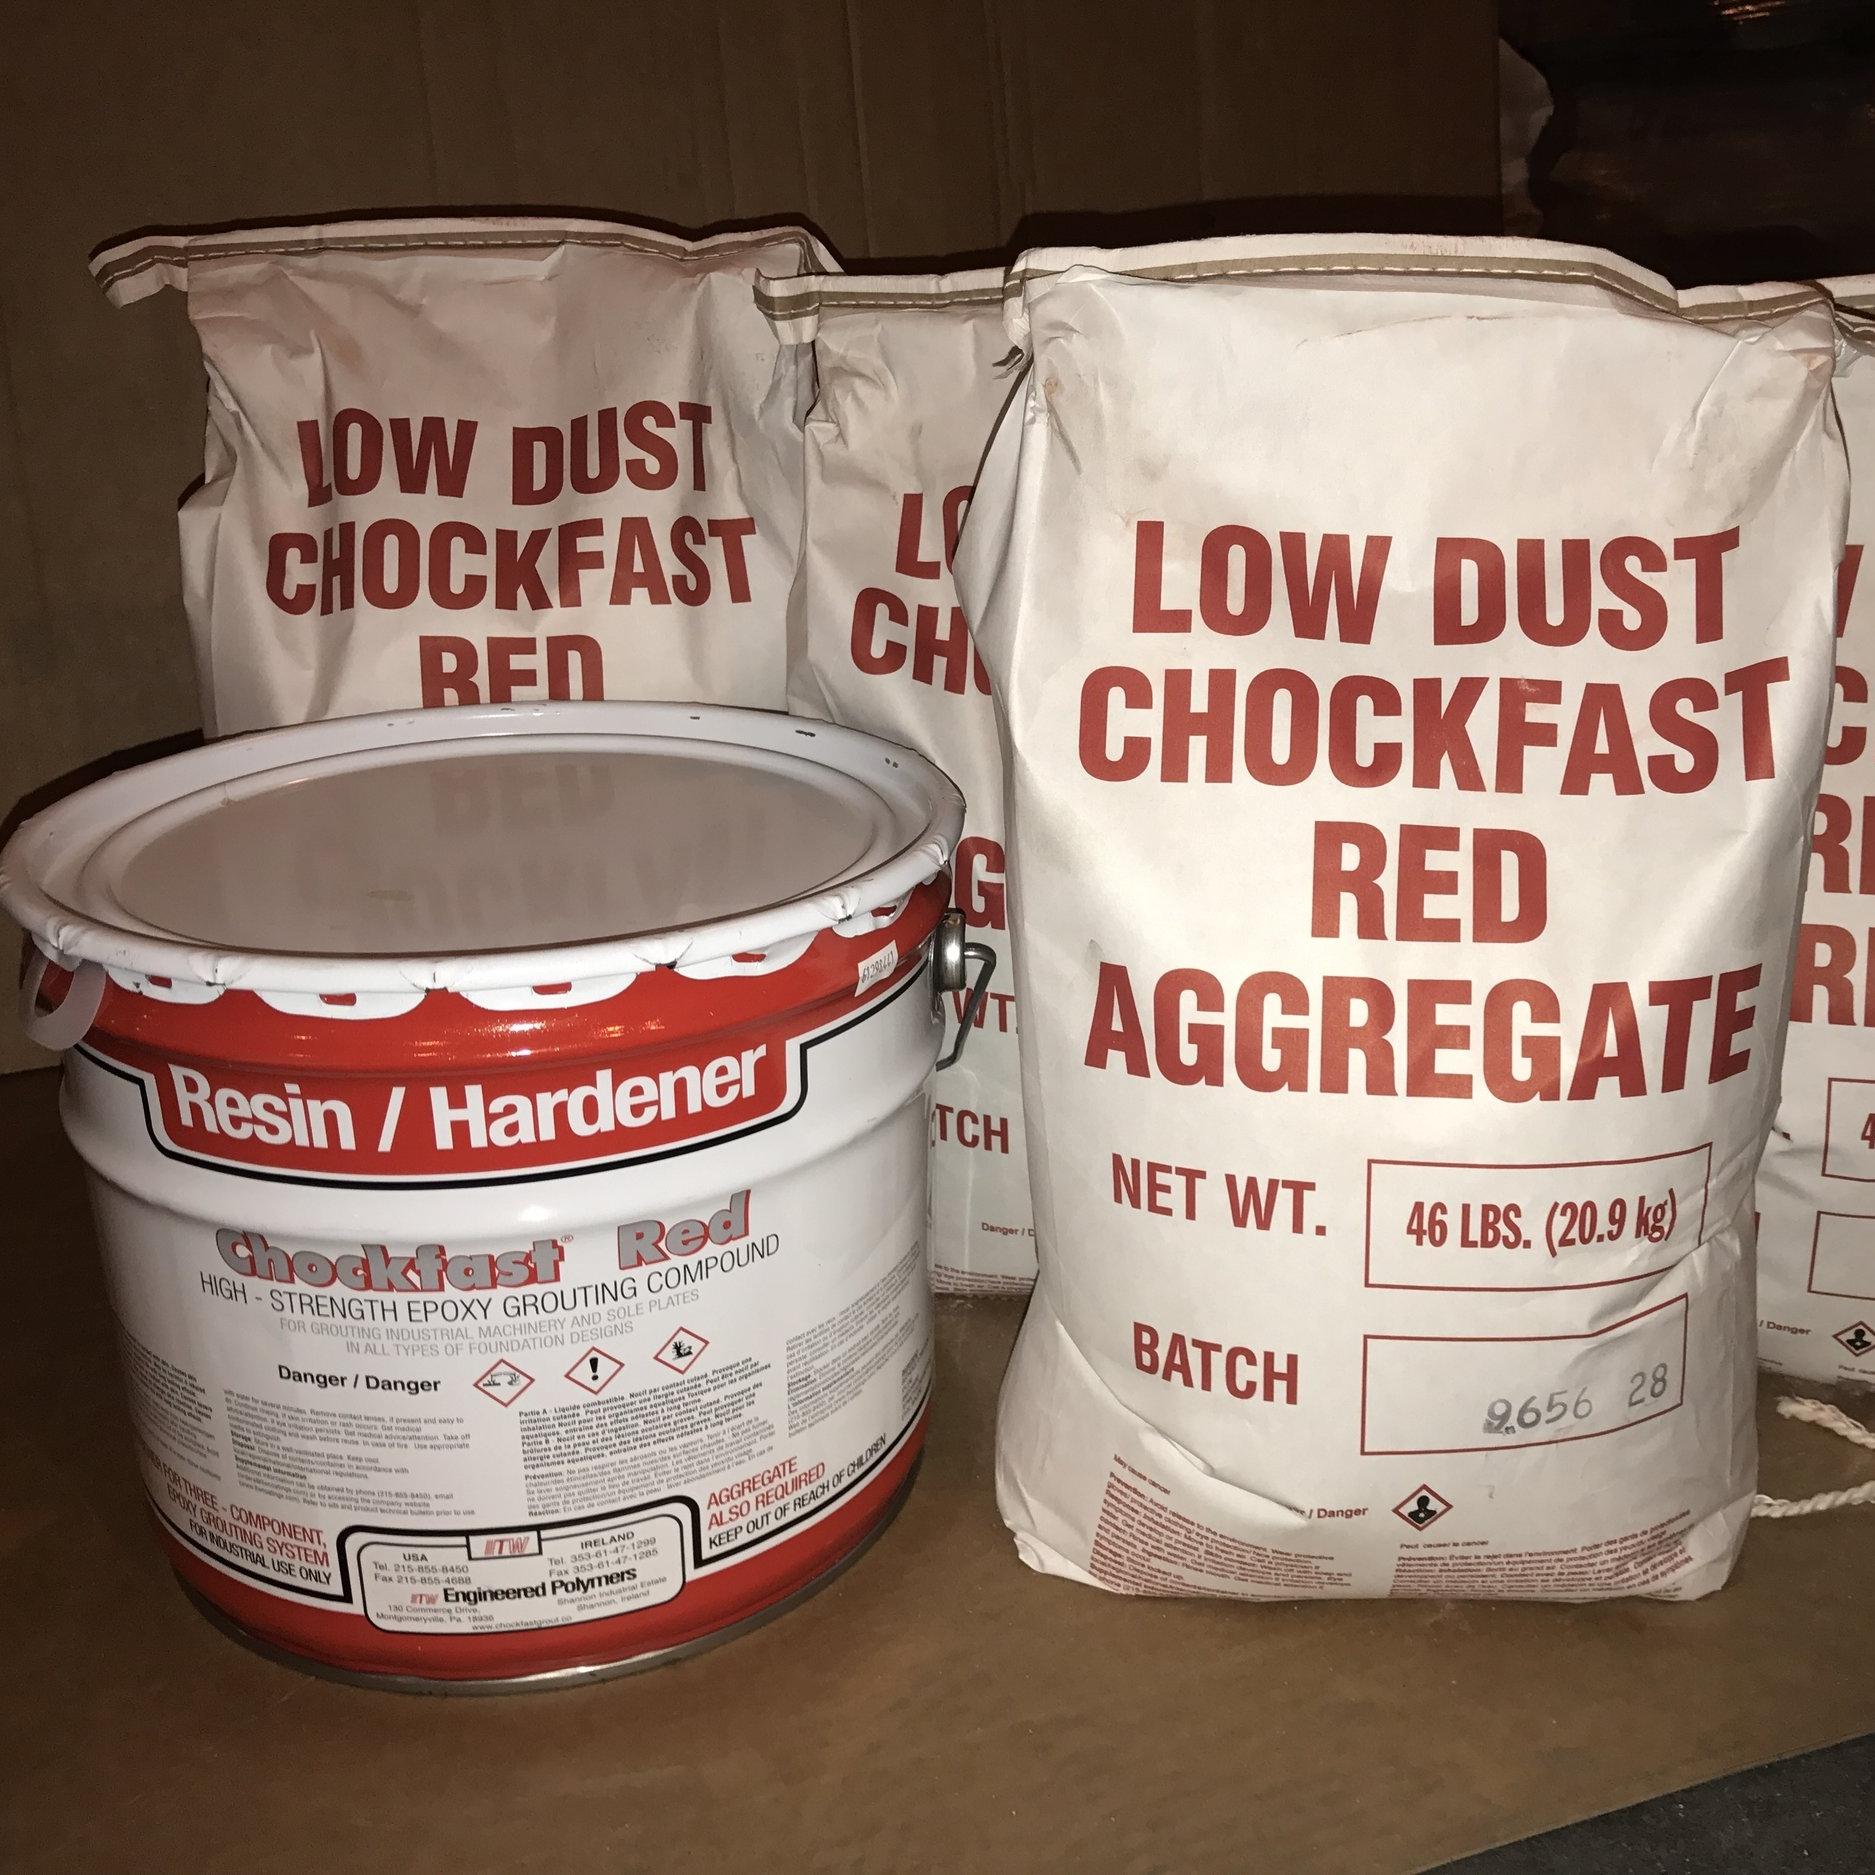 chockfast red